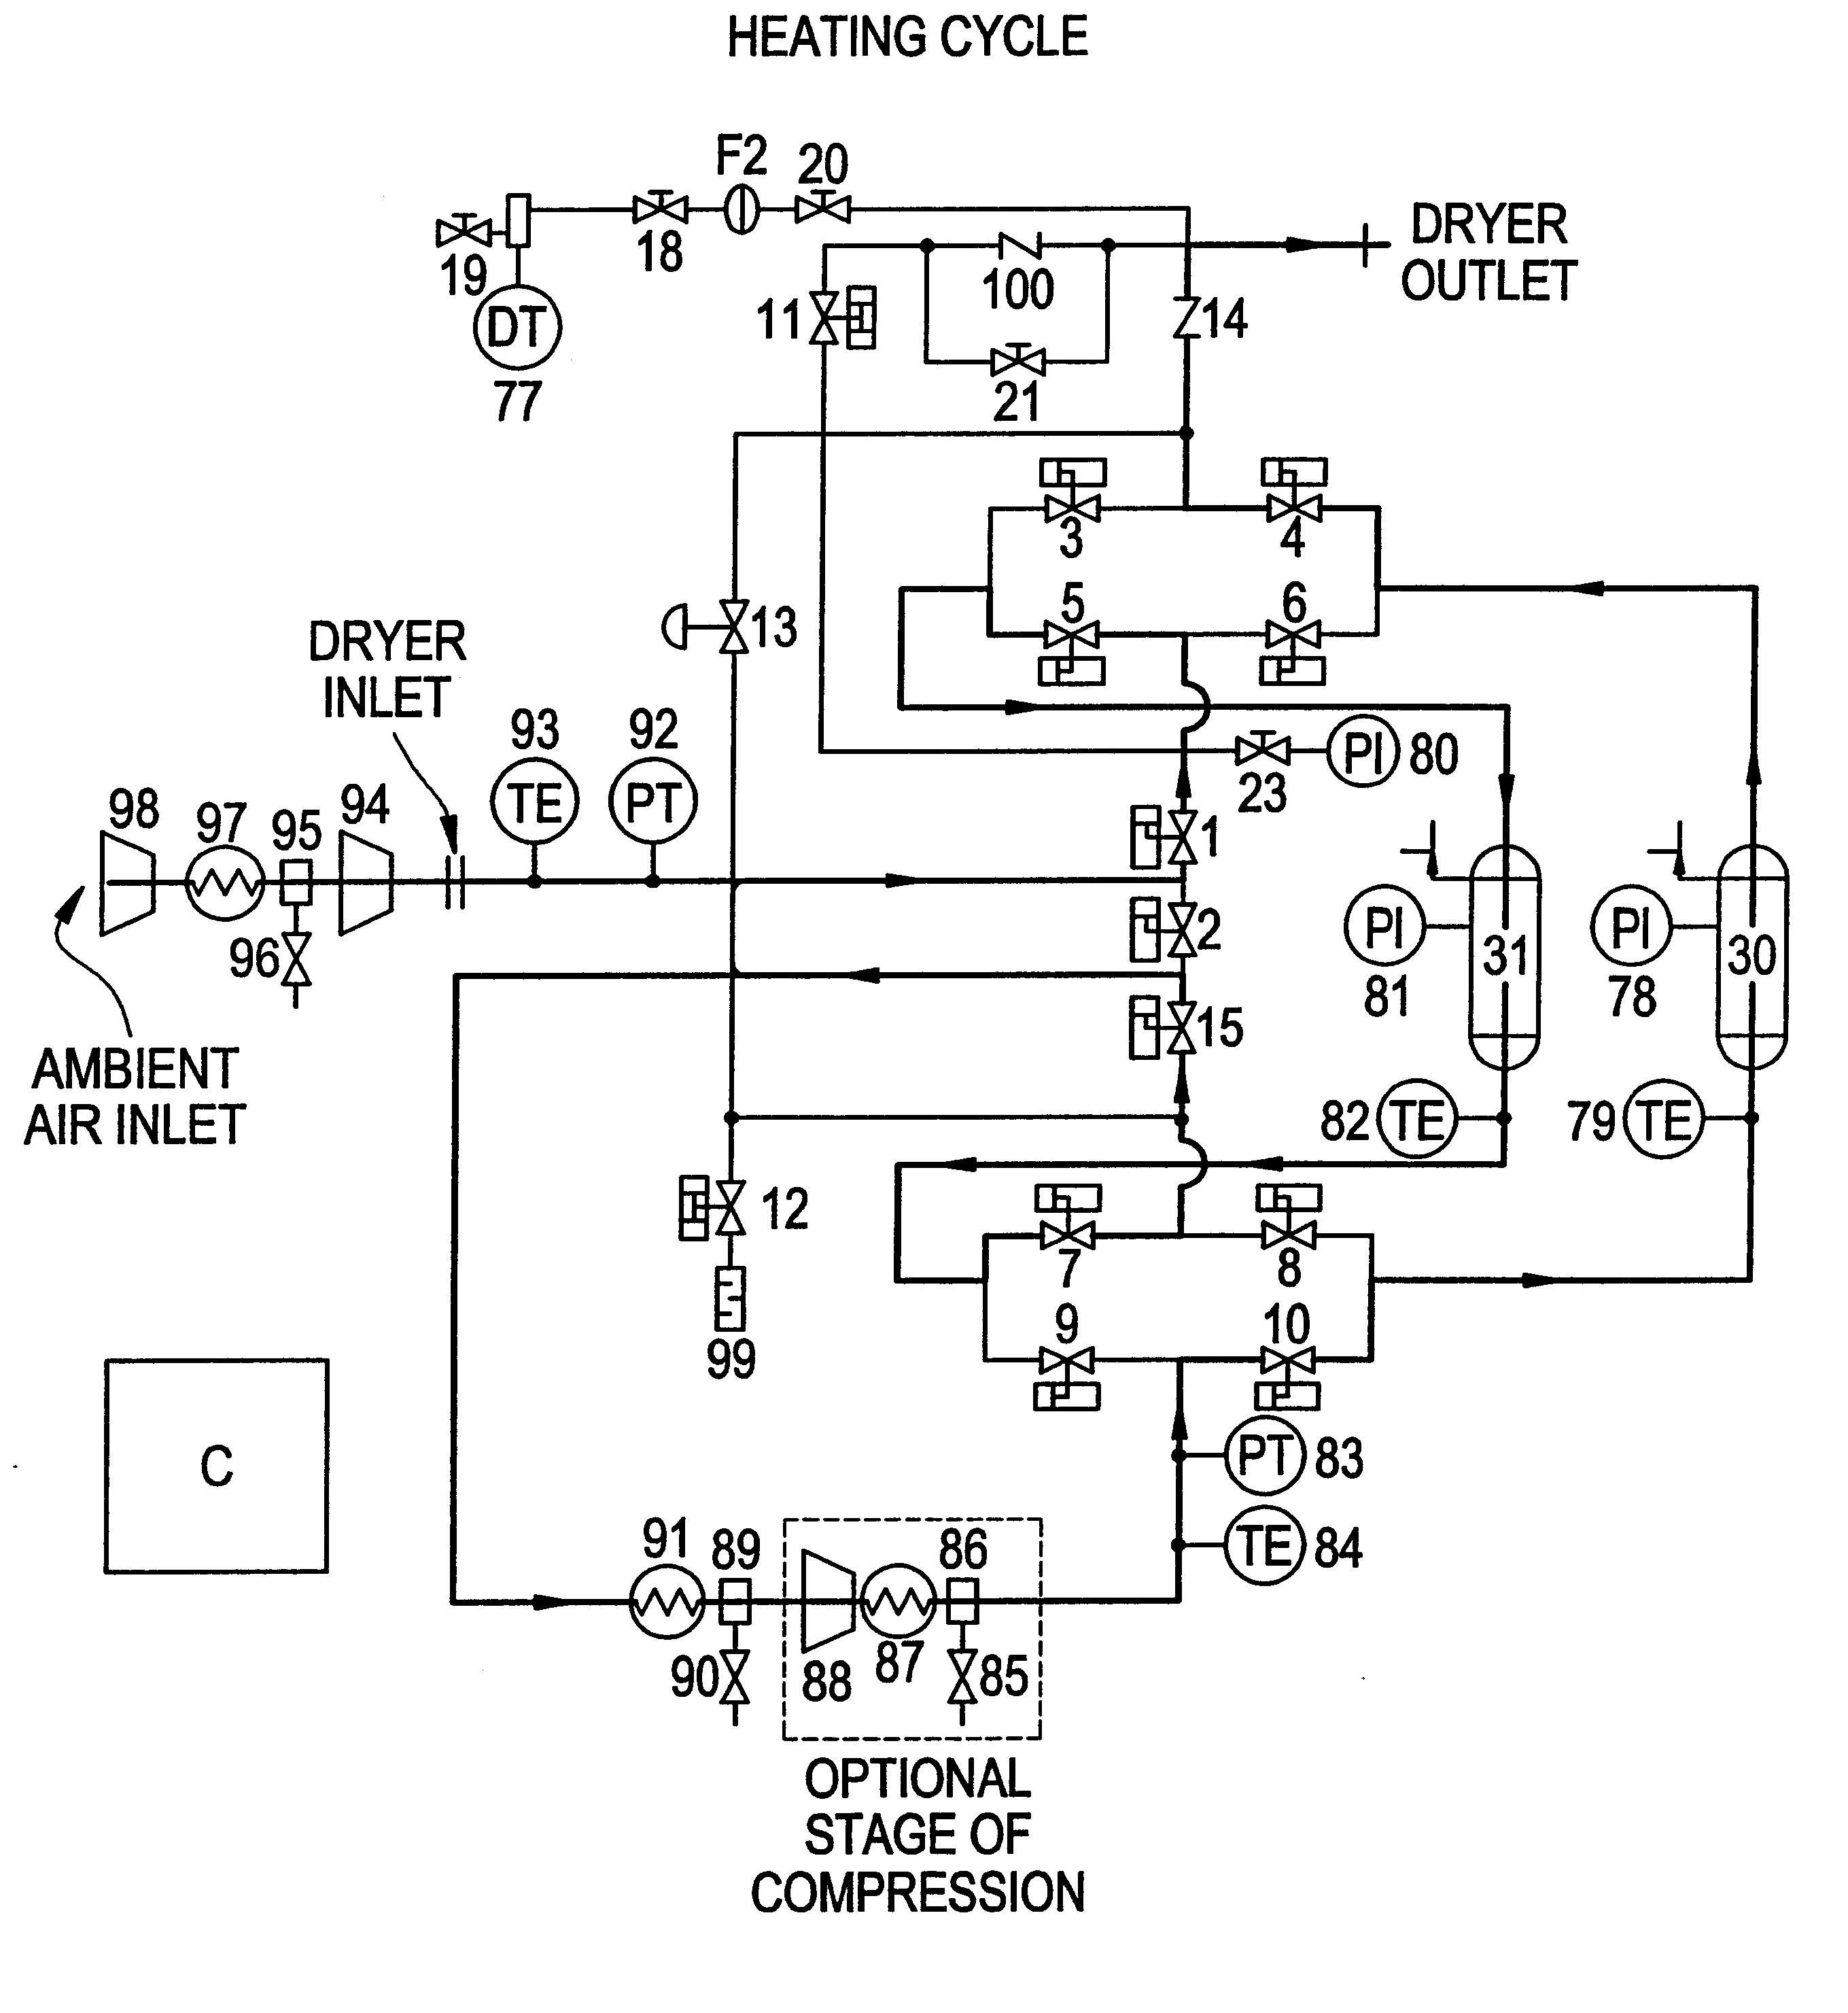 Brevet Us6767390 Energy Efficient Desiccant Dryer Regeneration Saver Circuit Patent Drawing